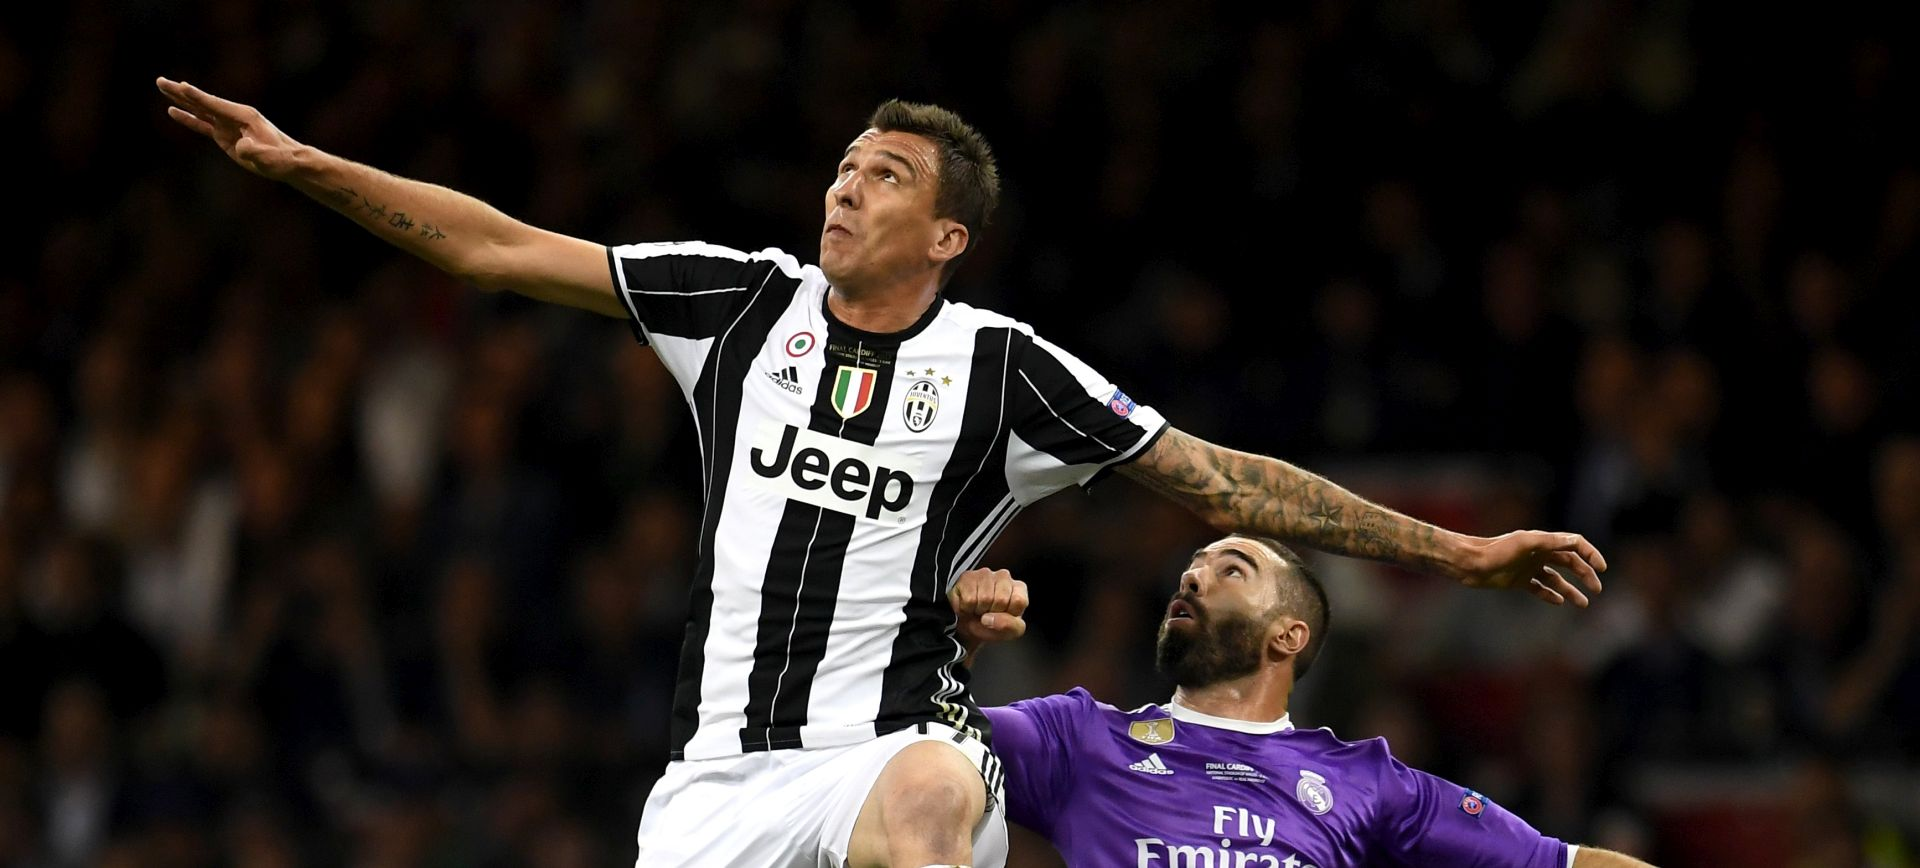 STARA DAMA POD RIMSKIM KOPITIMA Torino: Juventus – Lazio 1-2